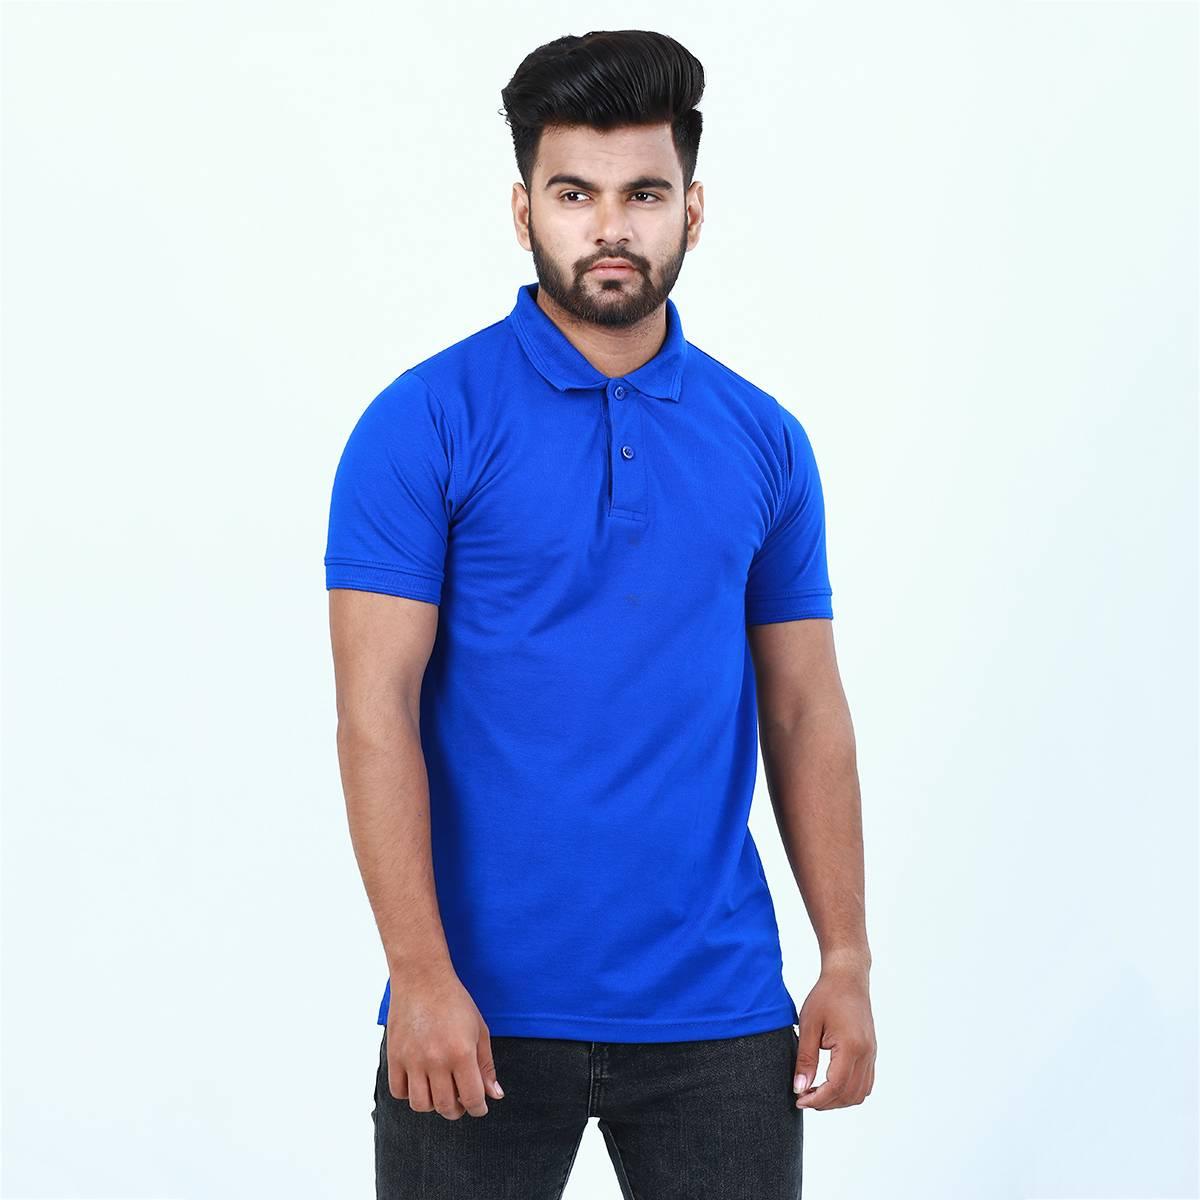 Anace Royal Blue 100% Cotton Polo Shirt for Men's